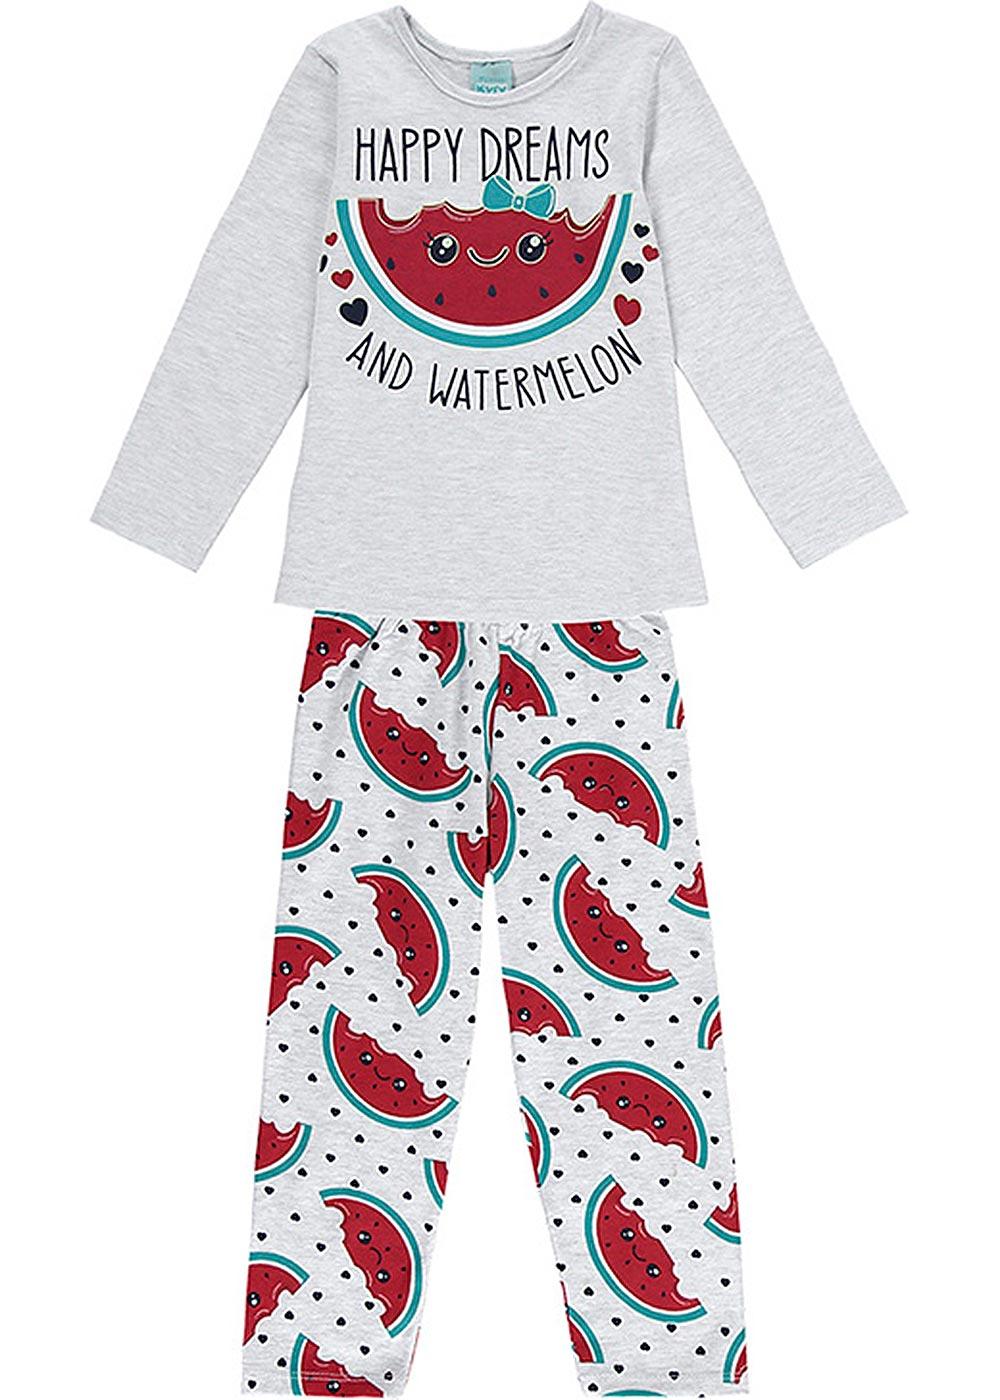 Pijama Infantil Feminino Inverno Cinza Happy Dreams - Kyly